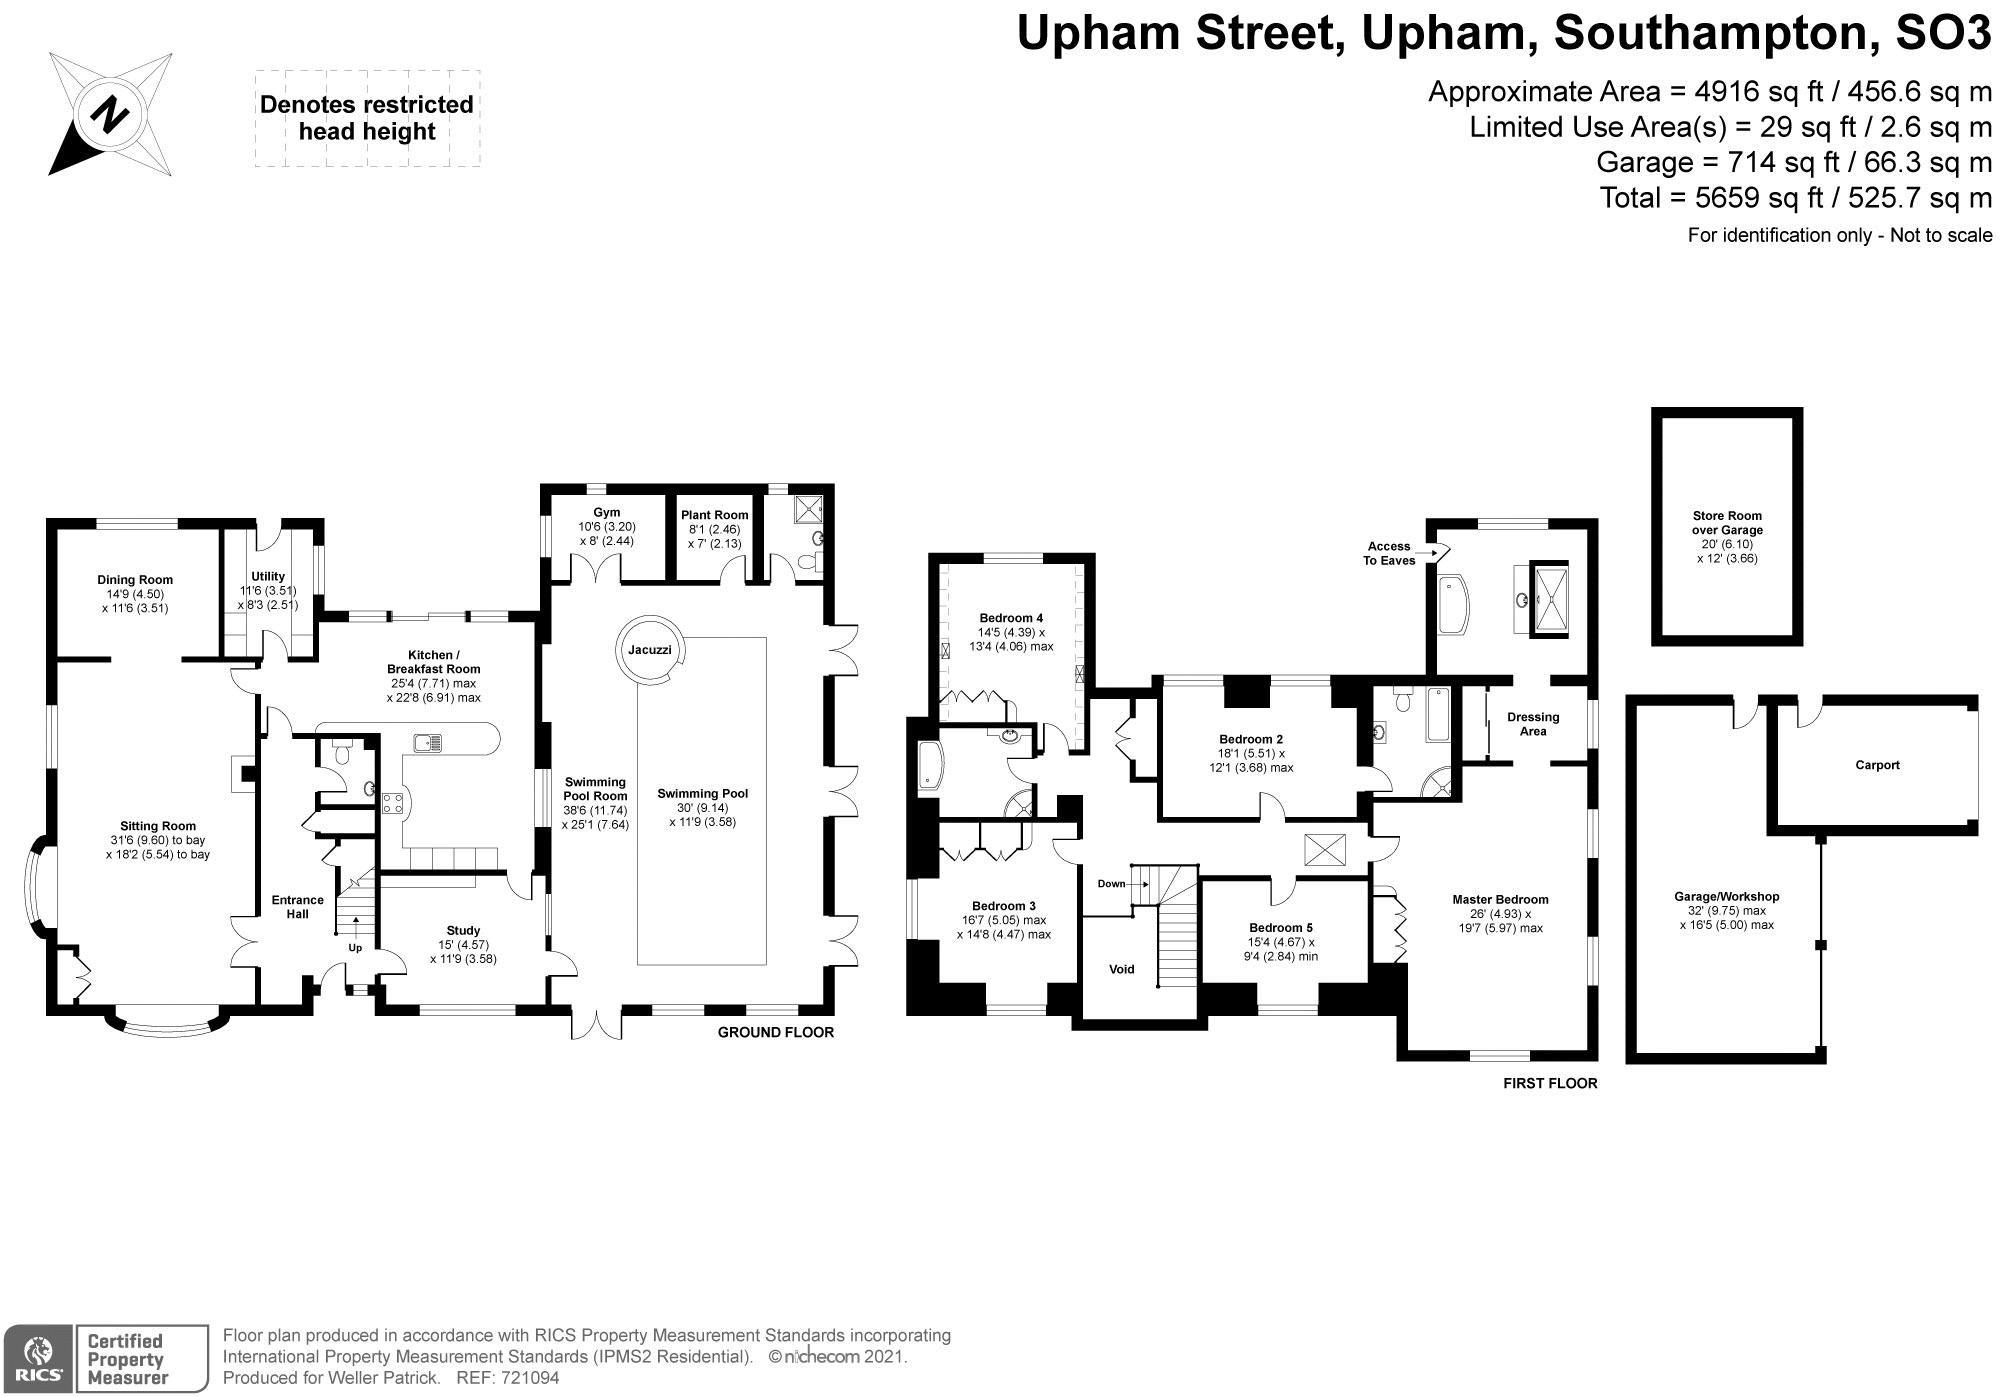 Upham Street Upham